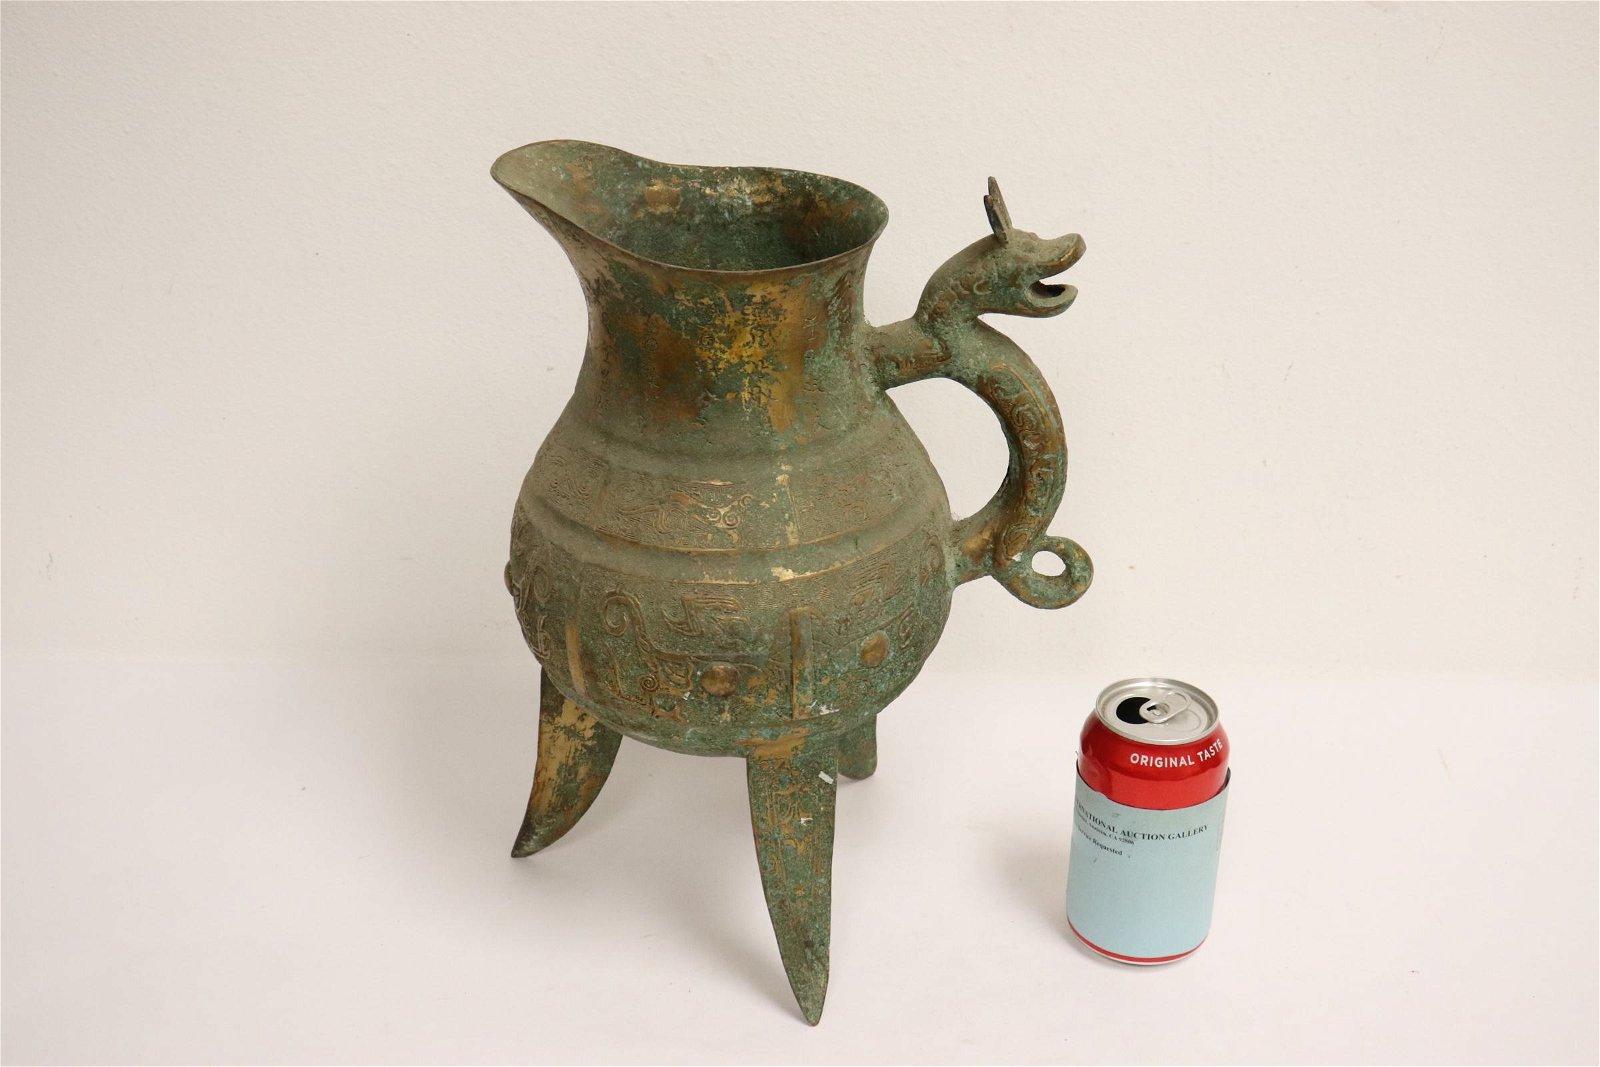 Chinese archaic style tripod wine server